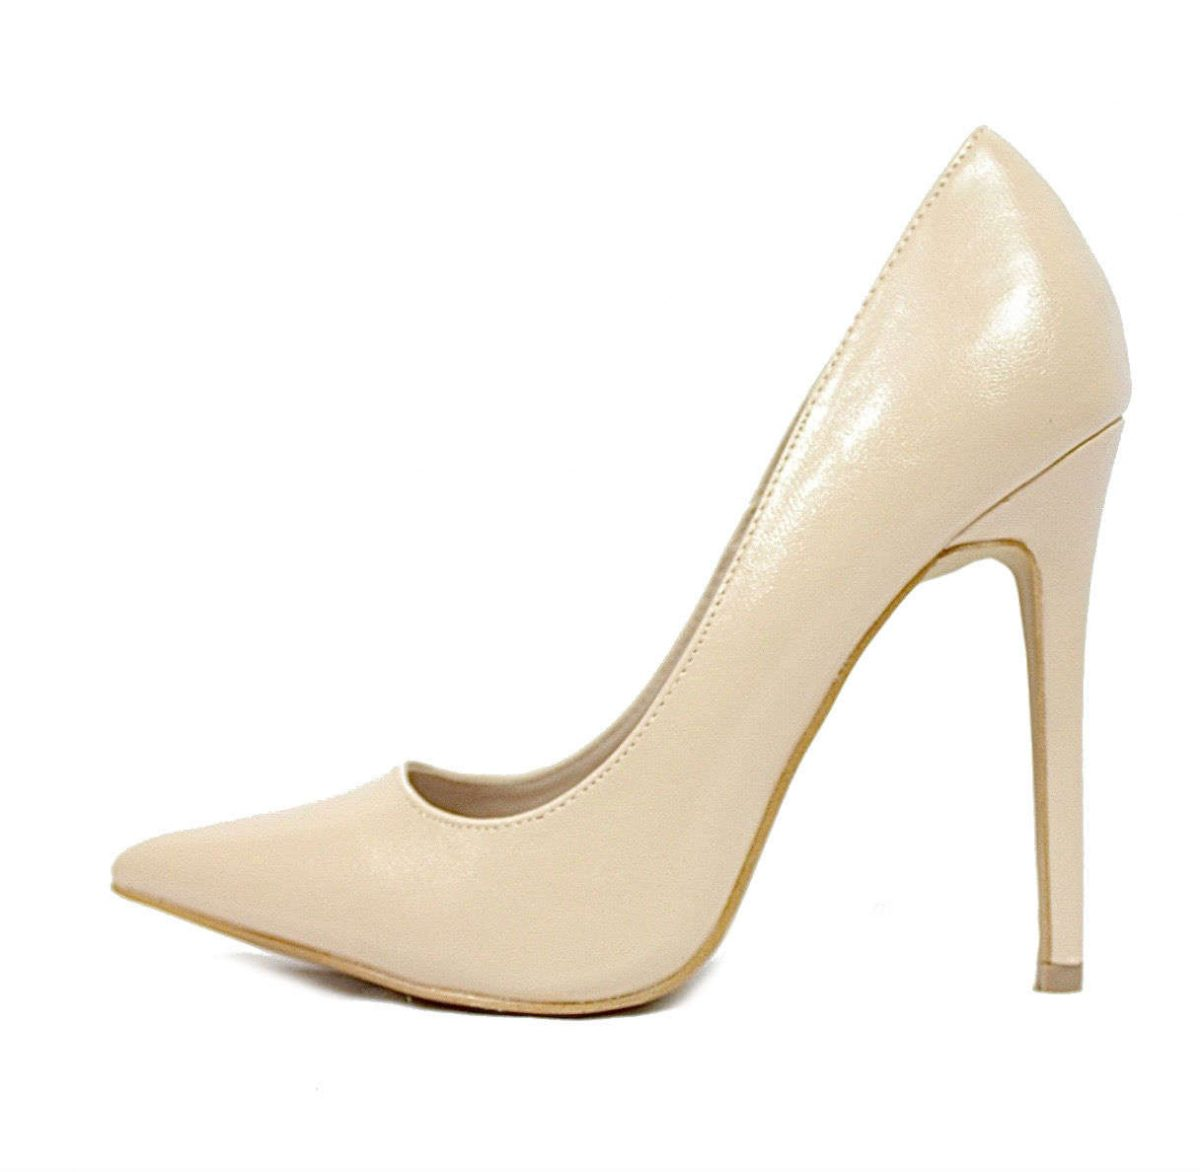 Shoe Republic Giuliana Nude Pointy Toe Pumps-0